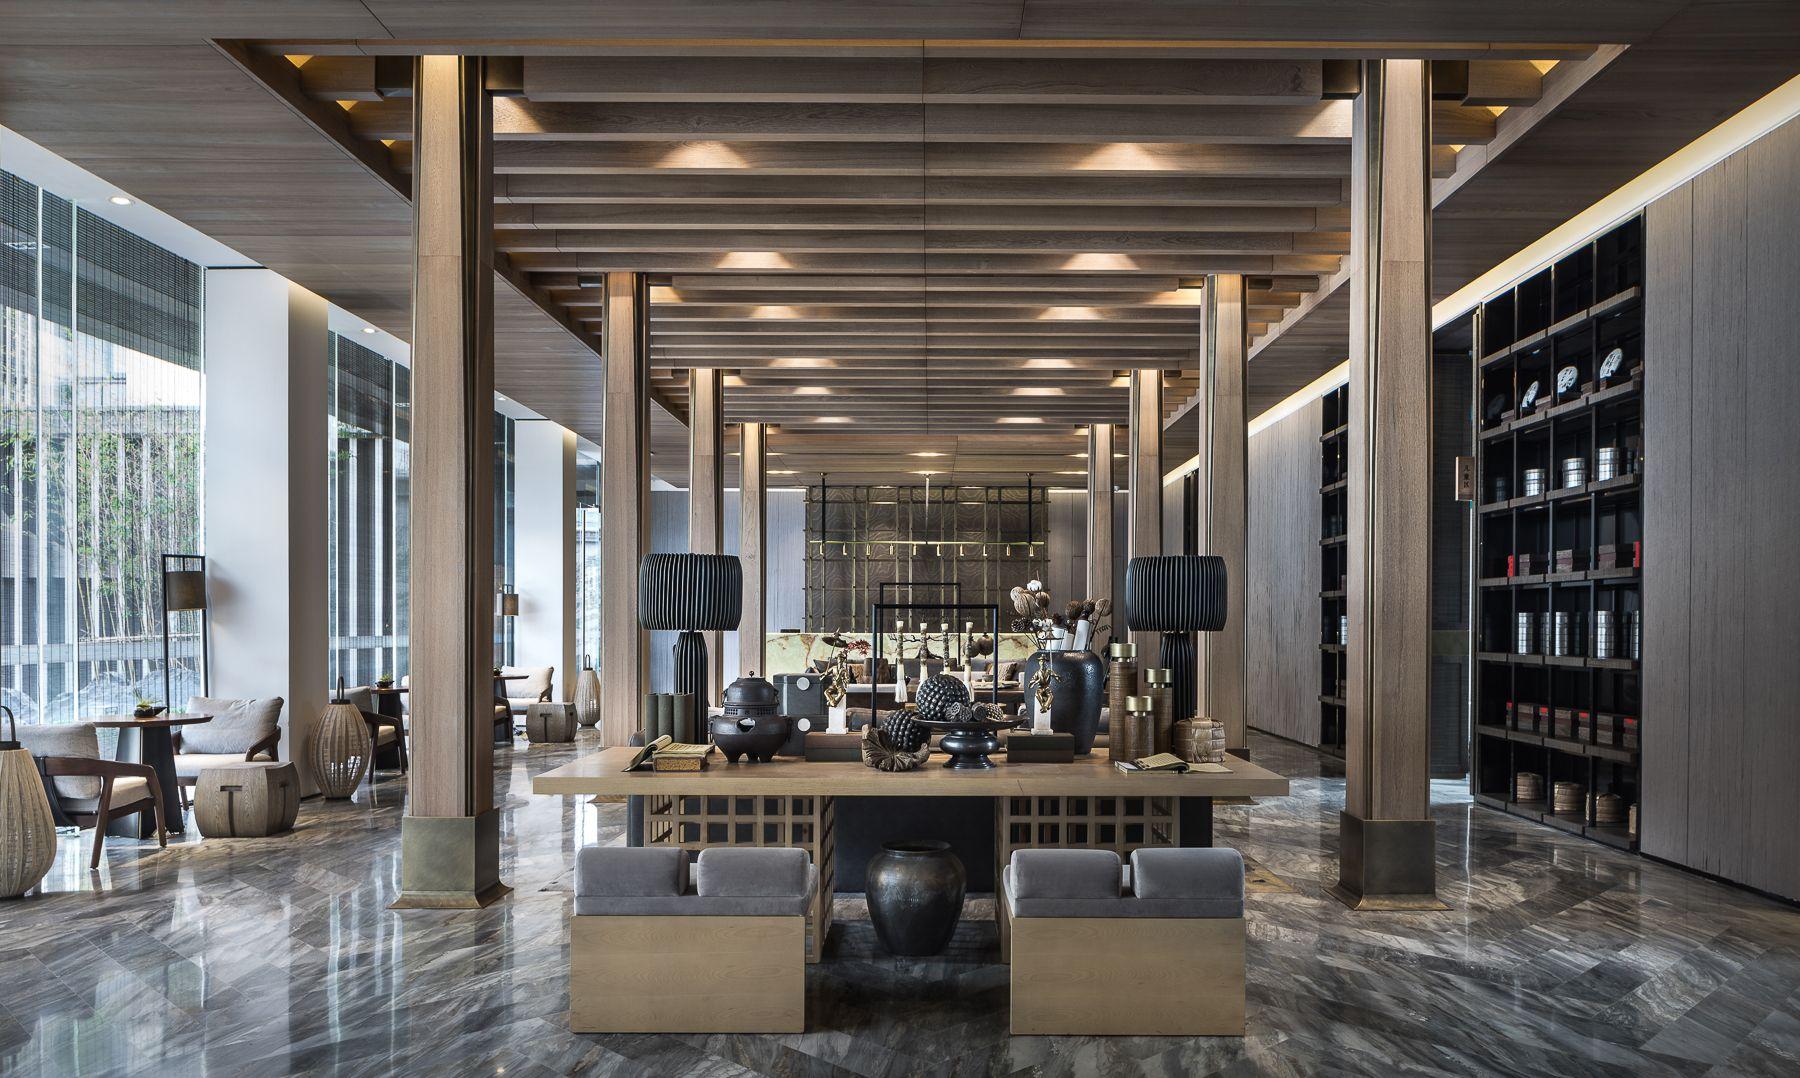 DOME&ASSOCIATES www.domecn.com   Hotel lobby design, Hotel lounge ...